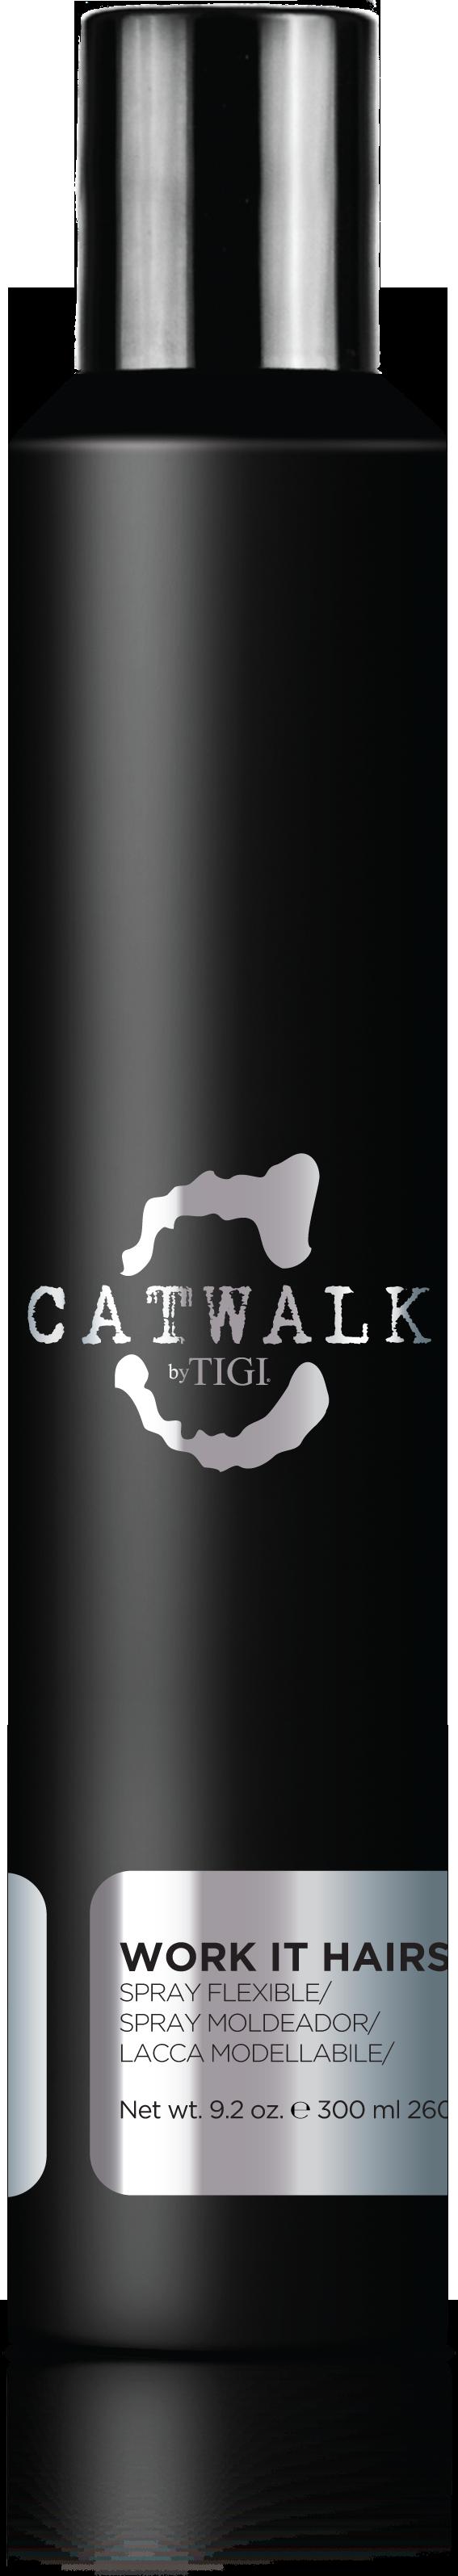 TIGI Catwalk Work it Hairspray 300ml